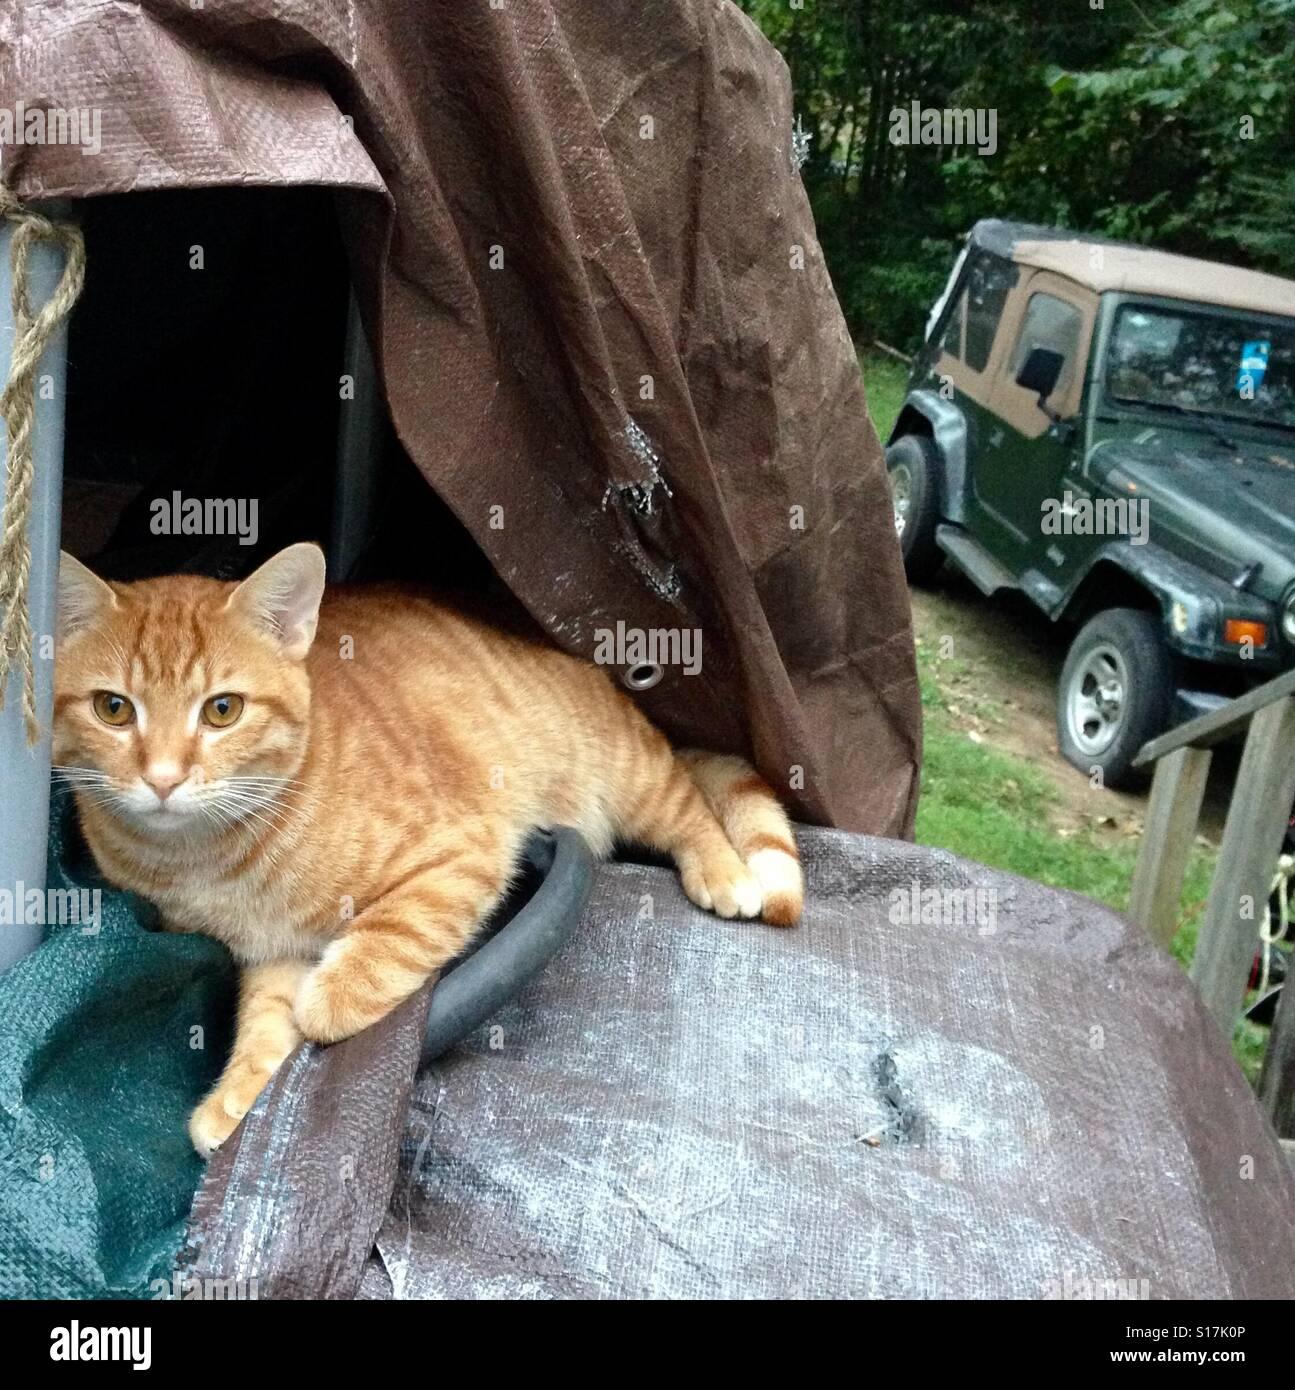 Beautiful and now 'murdered' orange tabby tomcat, a beloved outdoor pet that my evil next-door neighbor - Stock Image